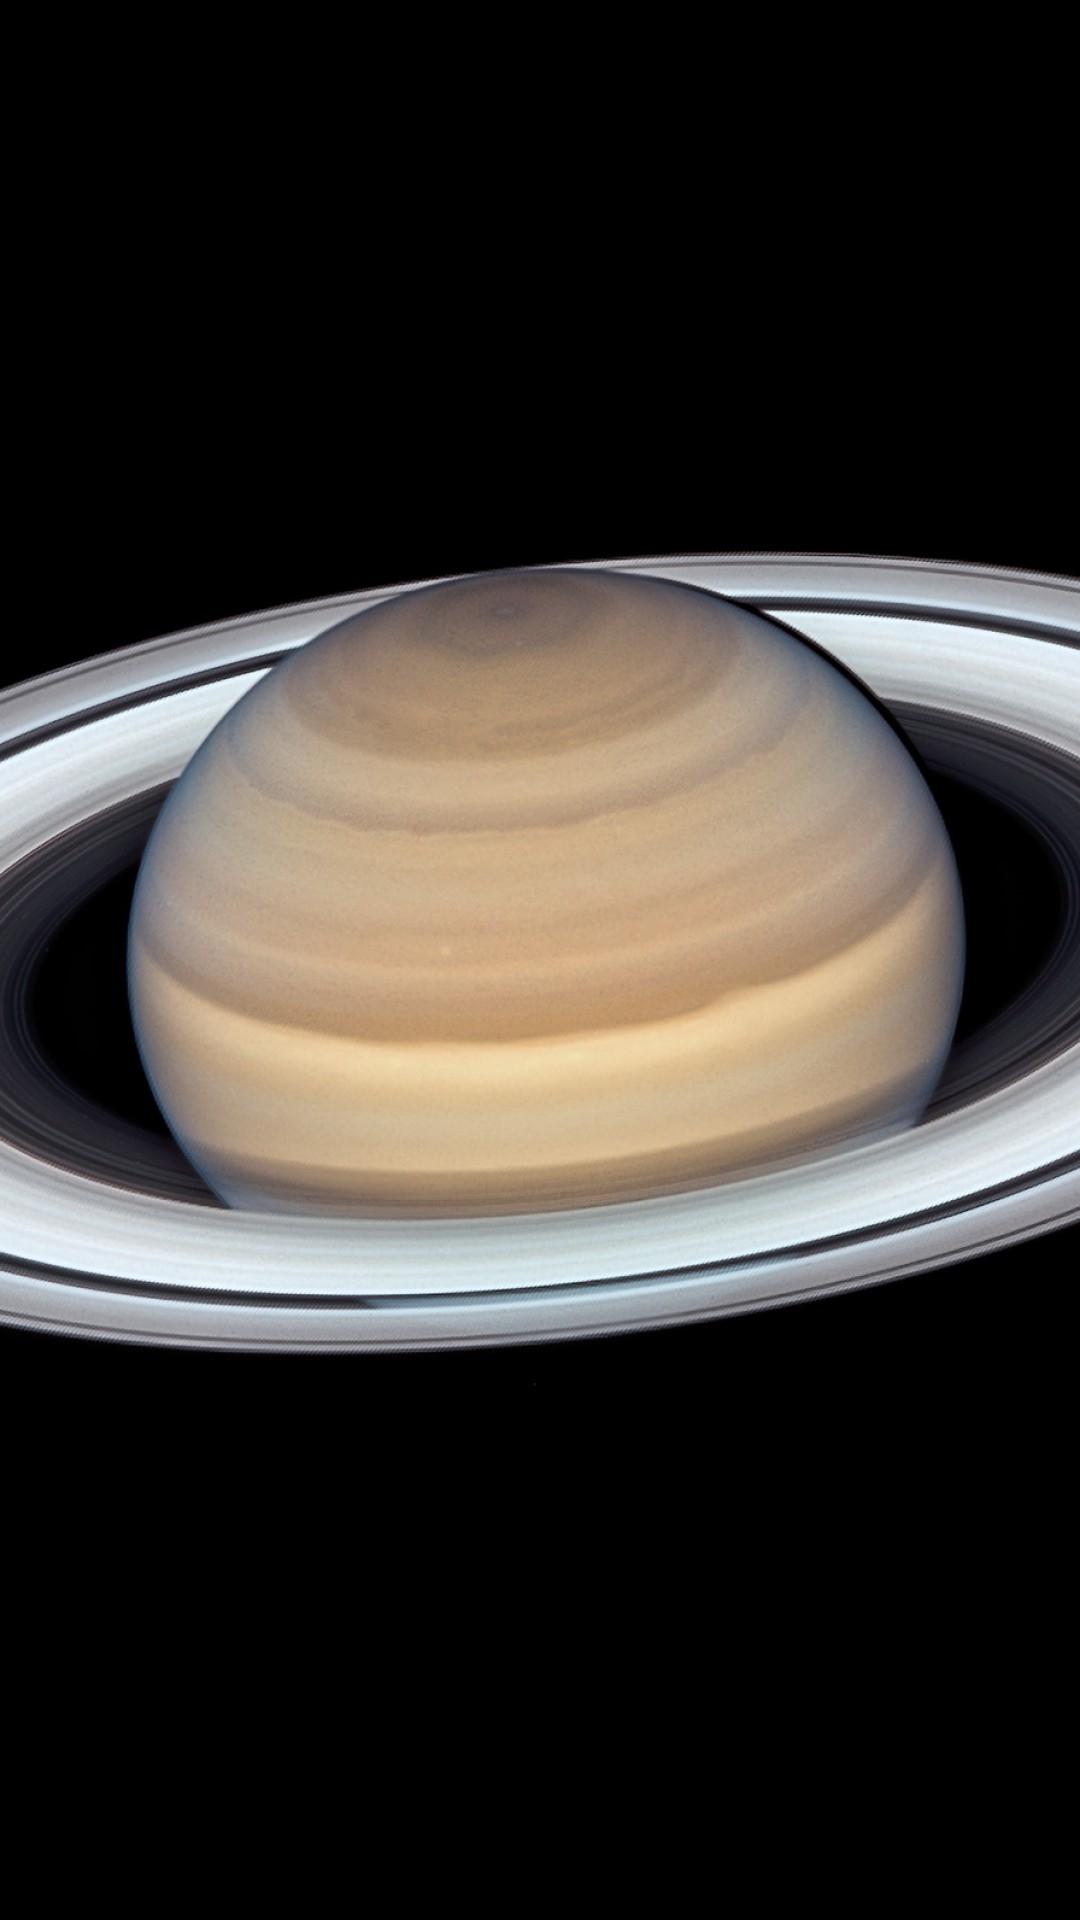 Saturn ios wallpaper